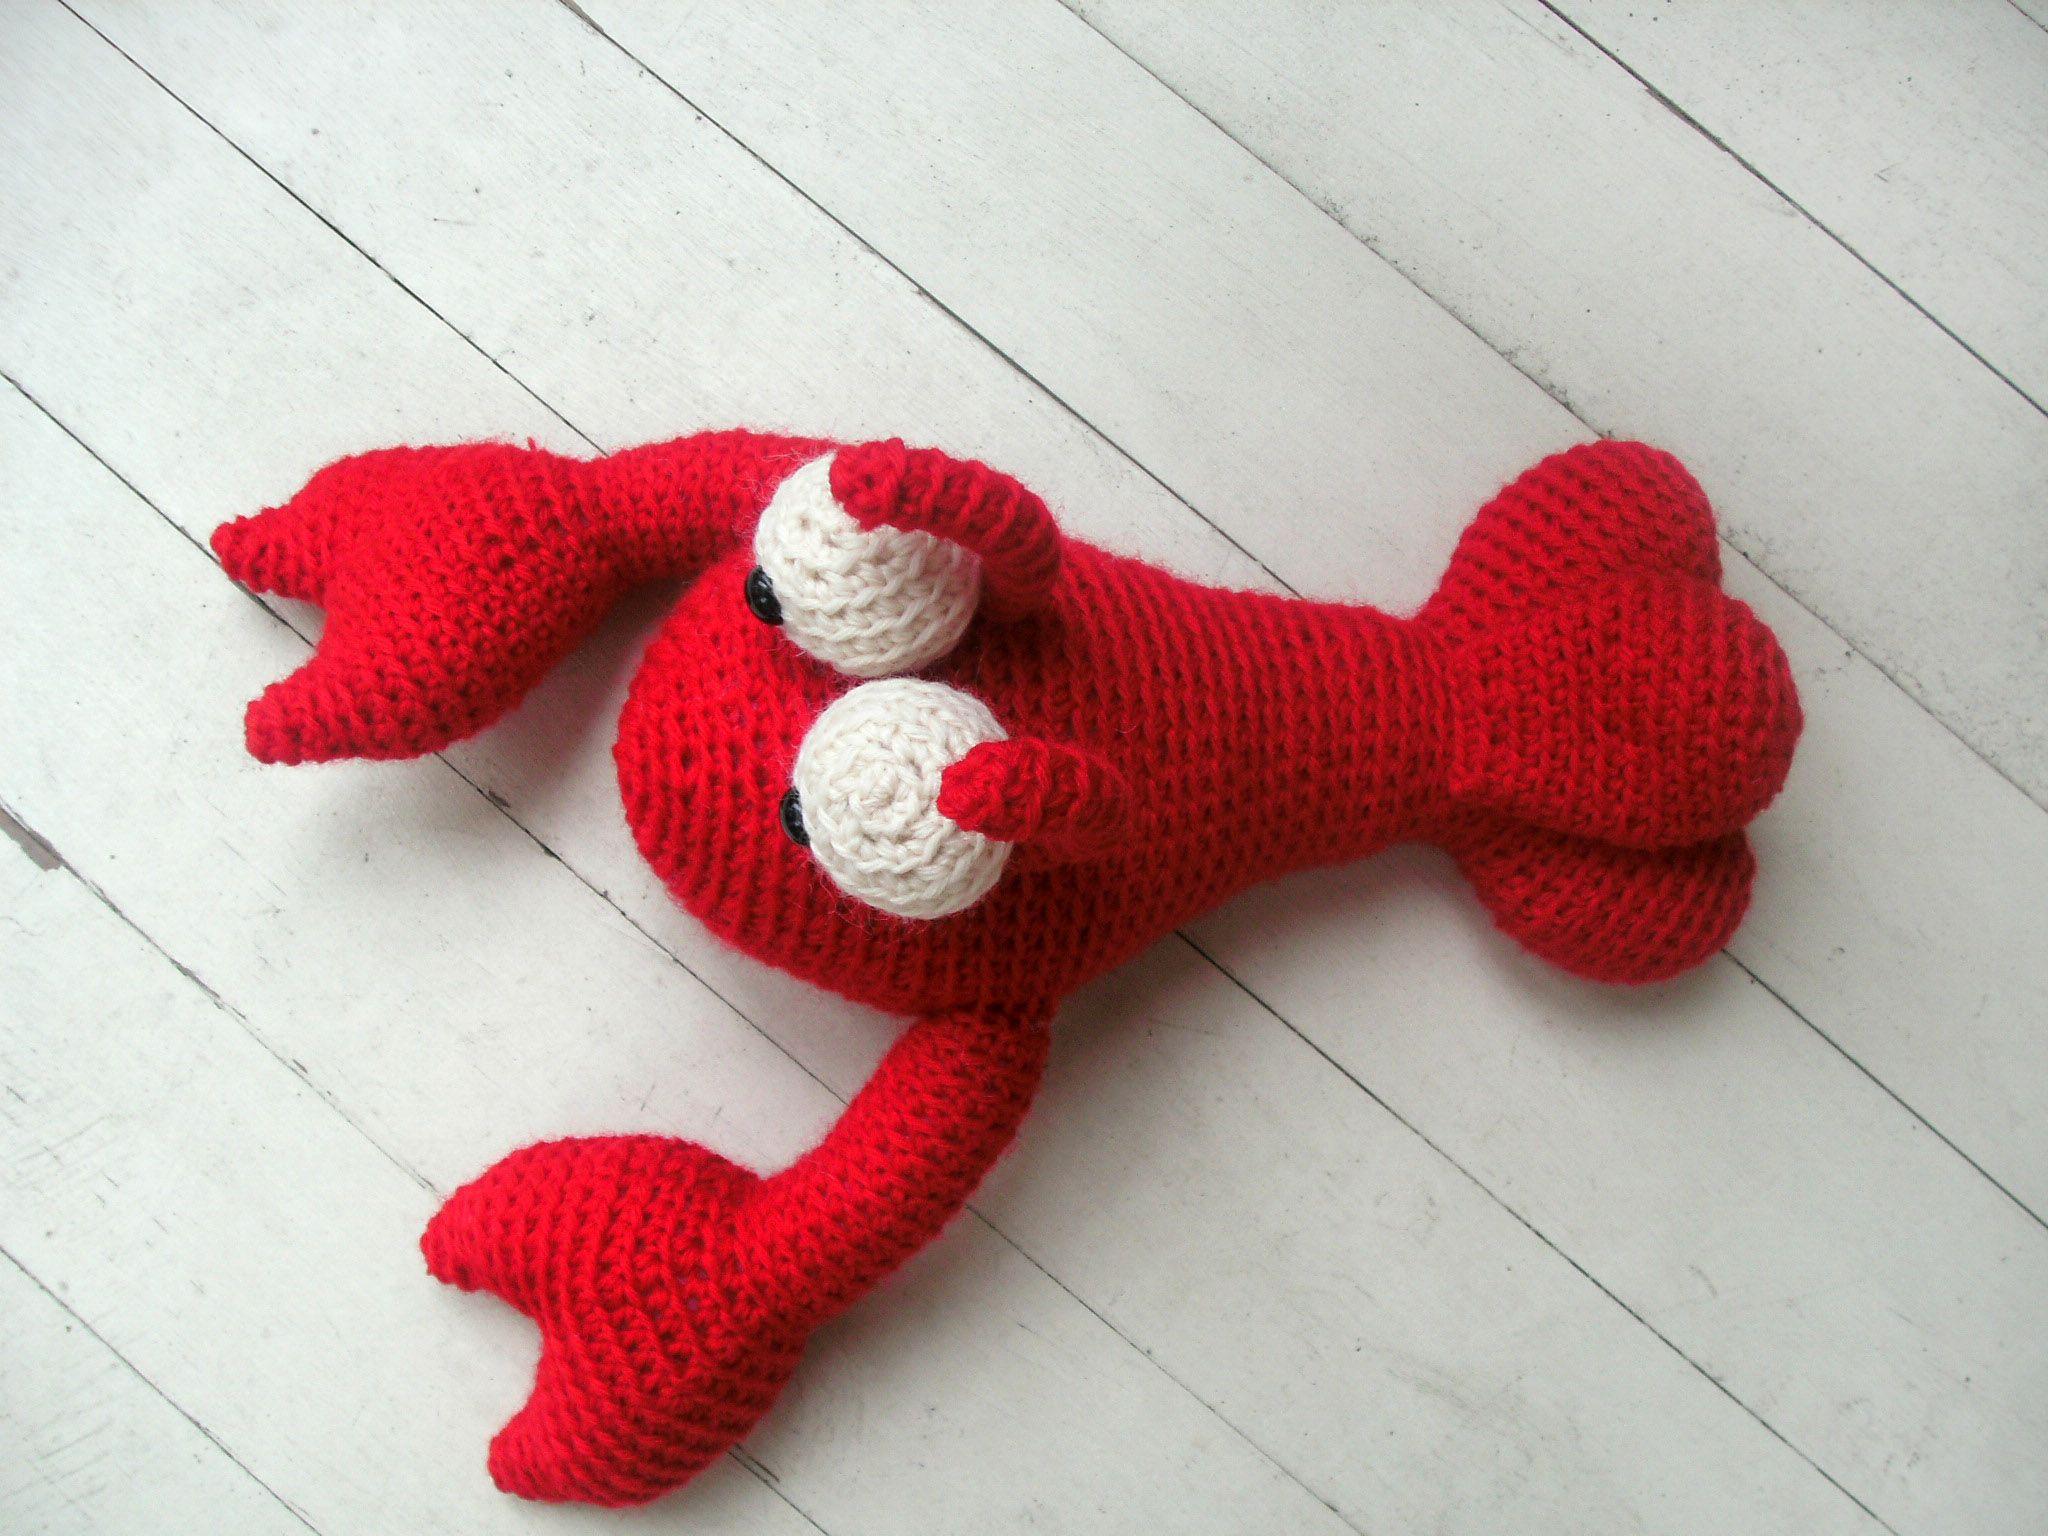 Cute Amigurumi Knitting Patterns : Free pattern alert frankie the lobster amigurumi crochet and